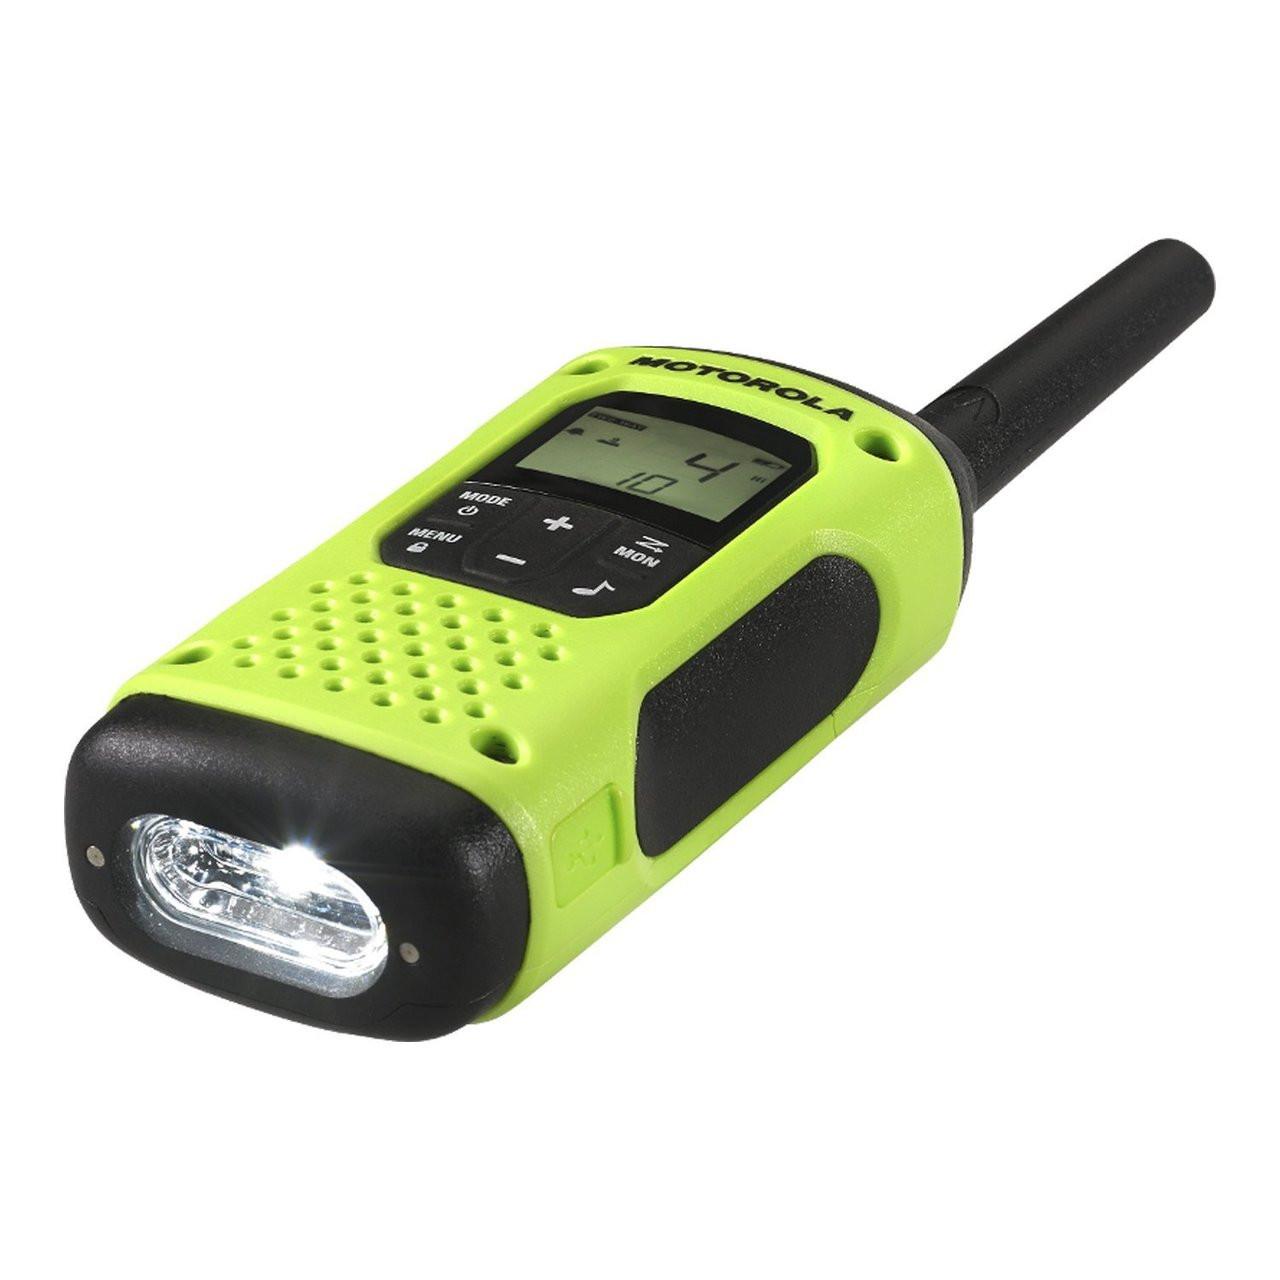 Motorola T600 Waterproof Two Way Radio with Integrated Flashlight